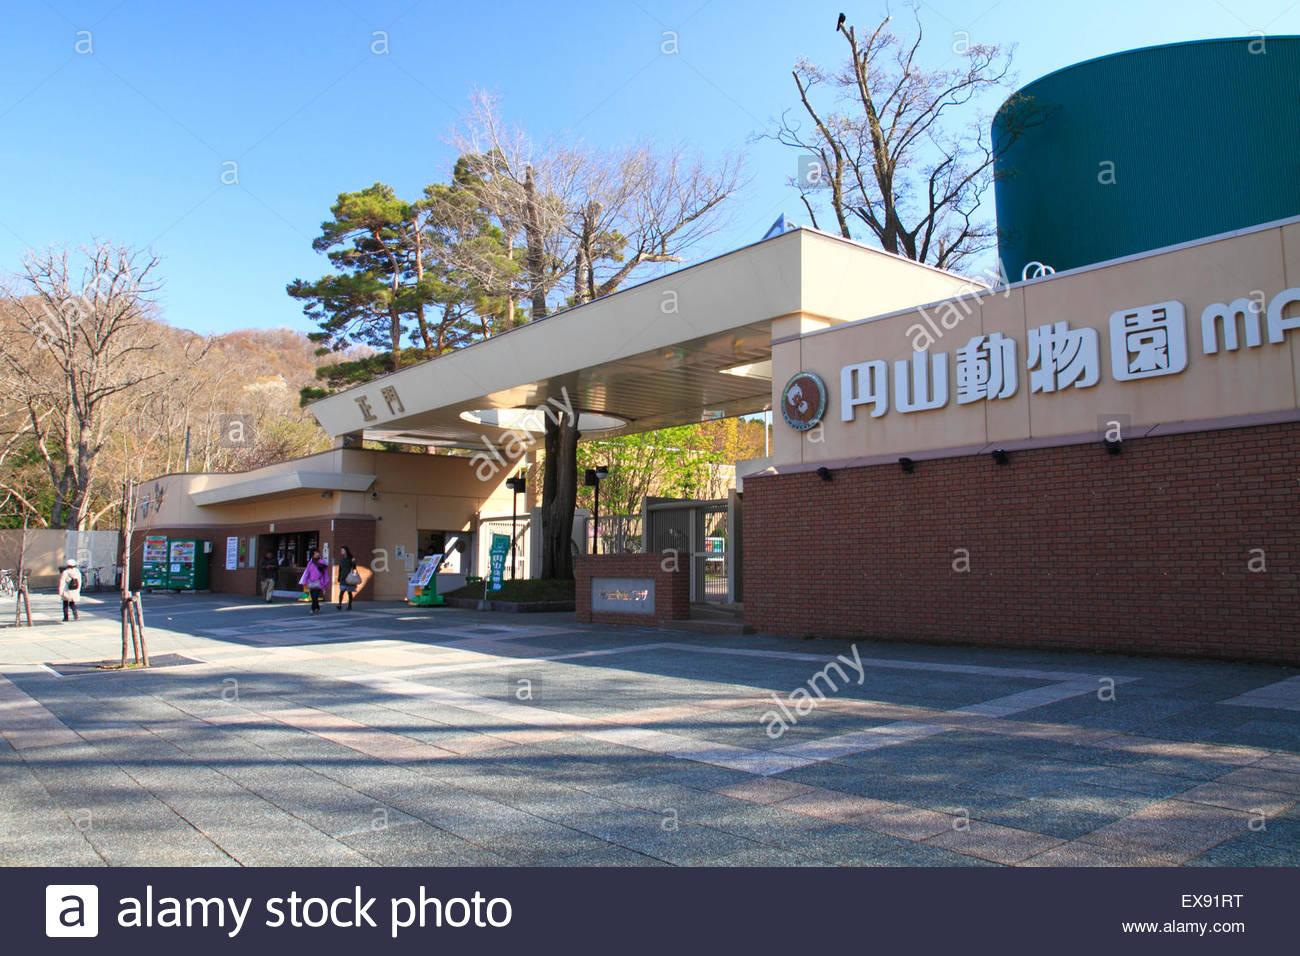 Japan, Hokkaido, Sapporo, Entrance of Sapporo Maruyama Zoo Stock Photo, Royal...